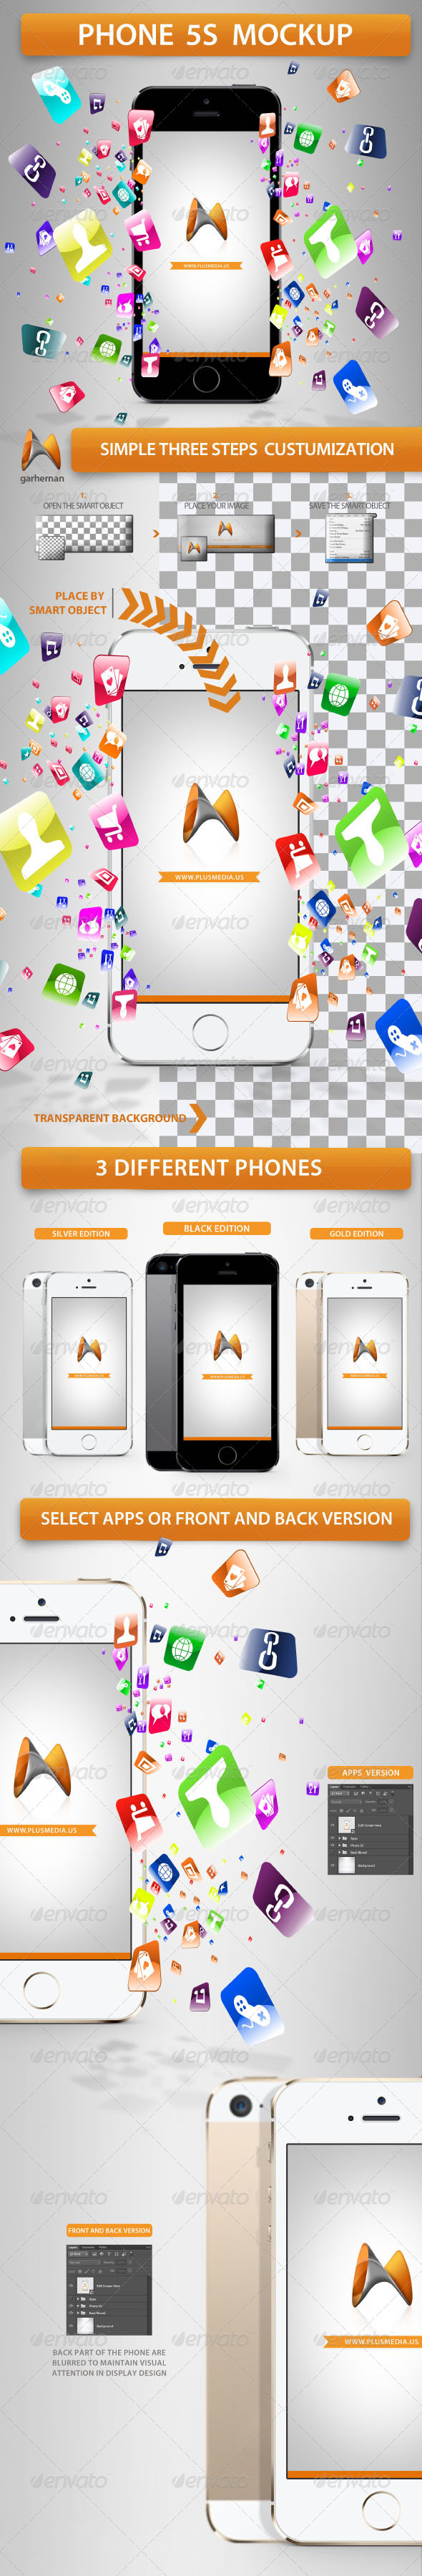 GraphicRiver Phone 5s Mockup 5625406